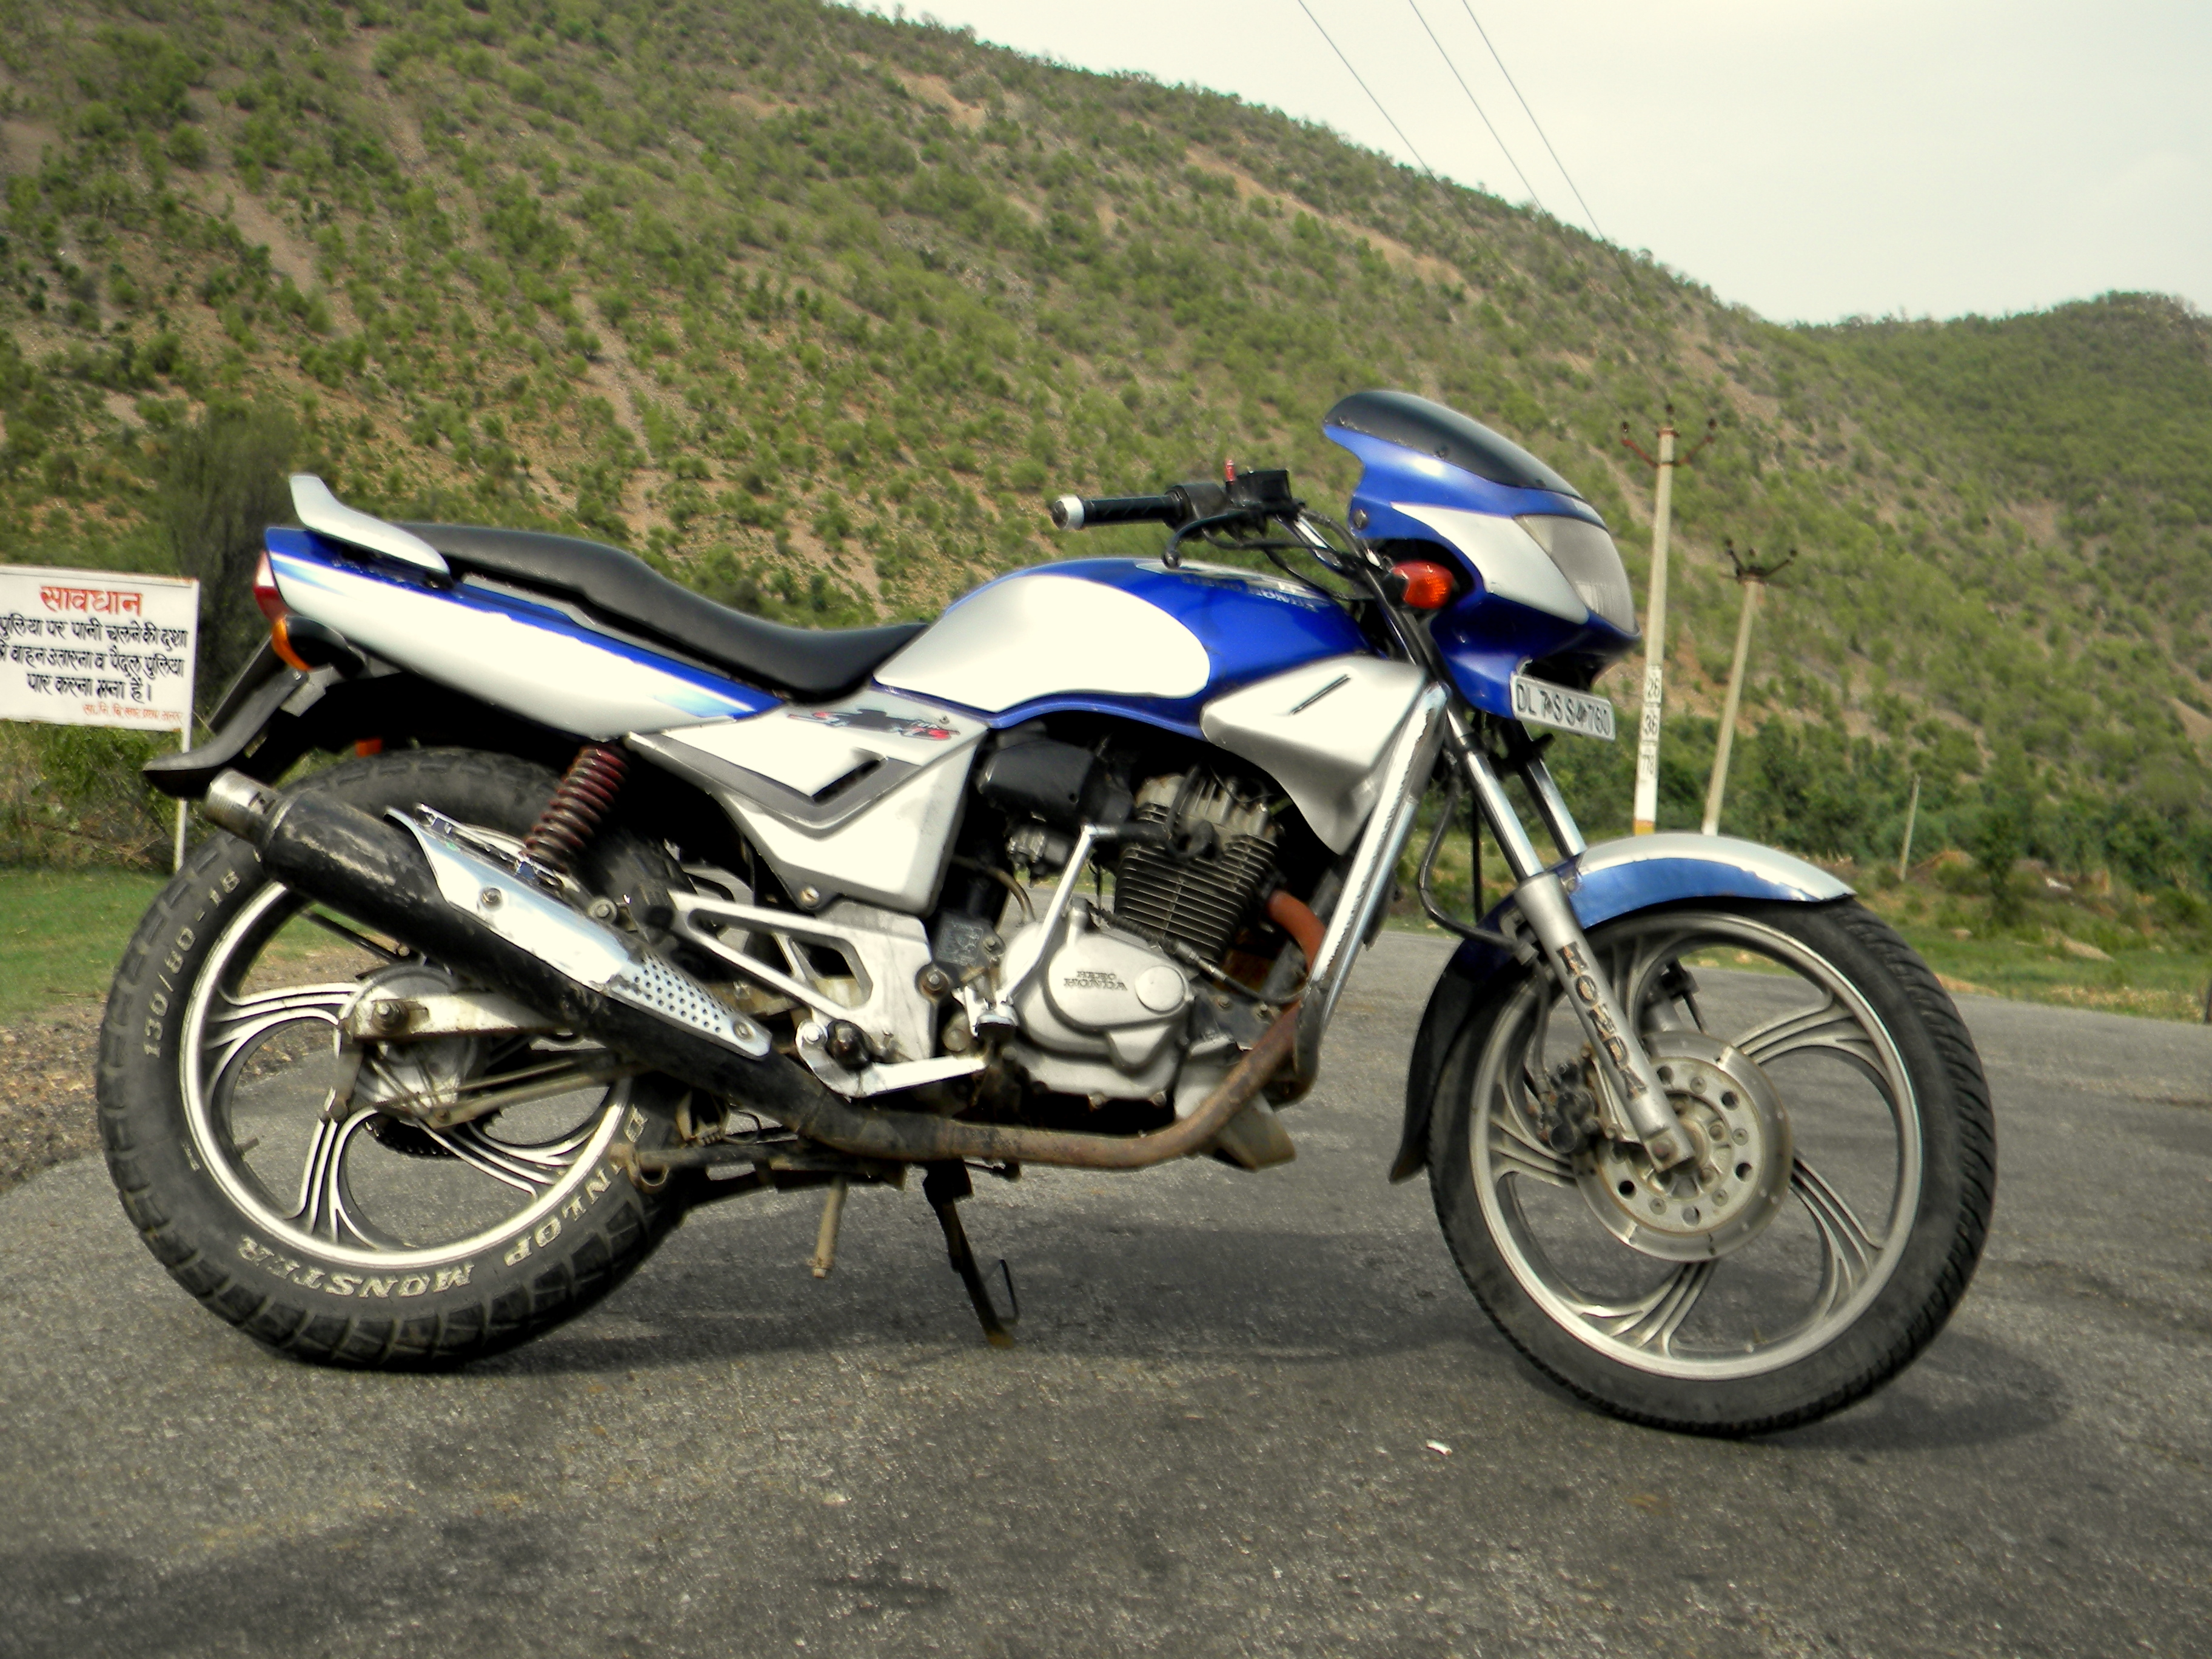 CBz - The ride of life :) - HERO HONDA CBZ - DISC BRAKE Customer